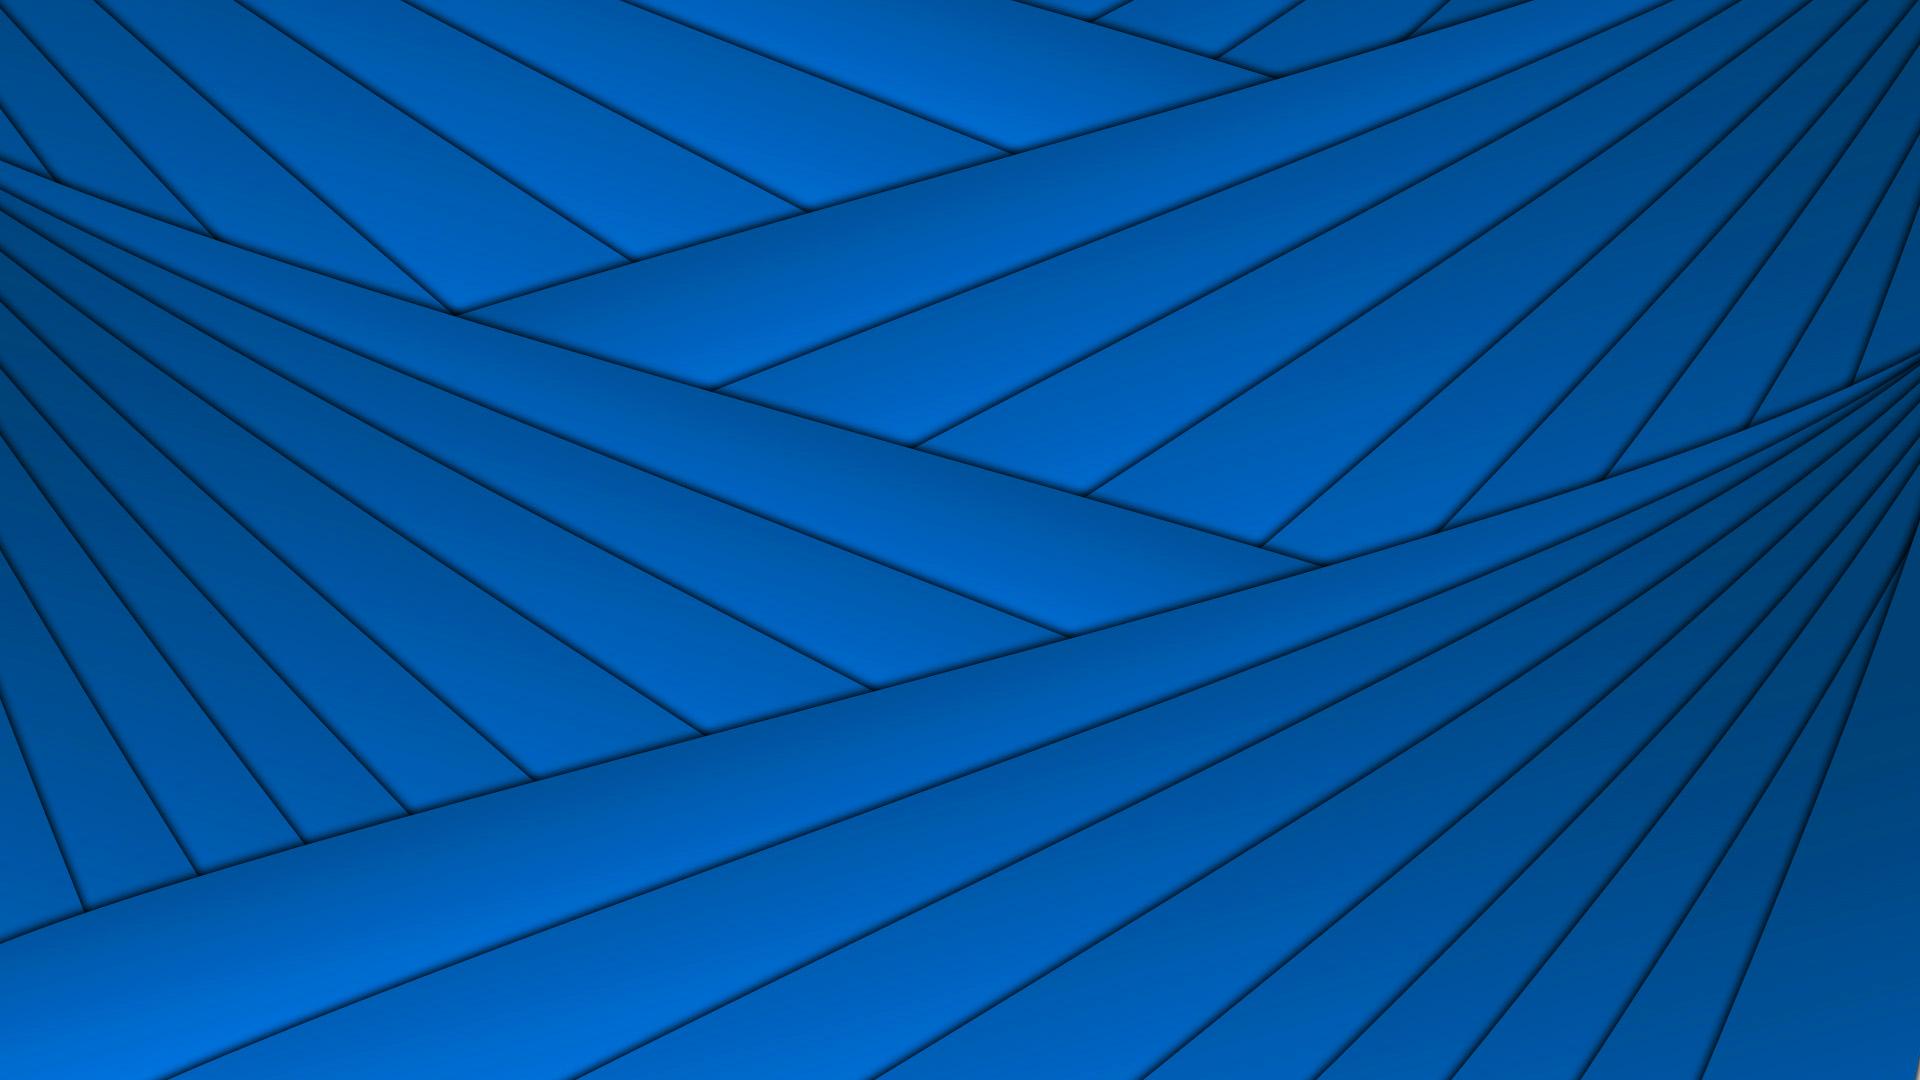 Dark Textures clipart blue texture background Rays Blue vector texture blue